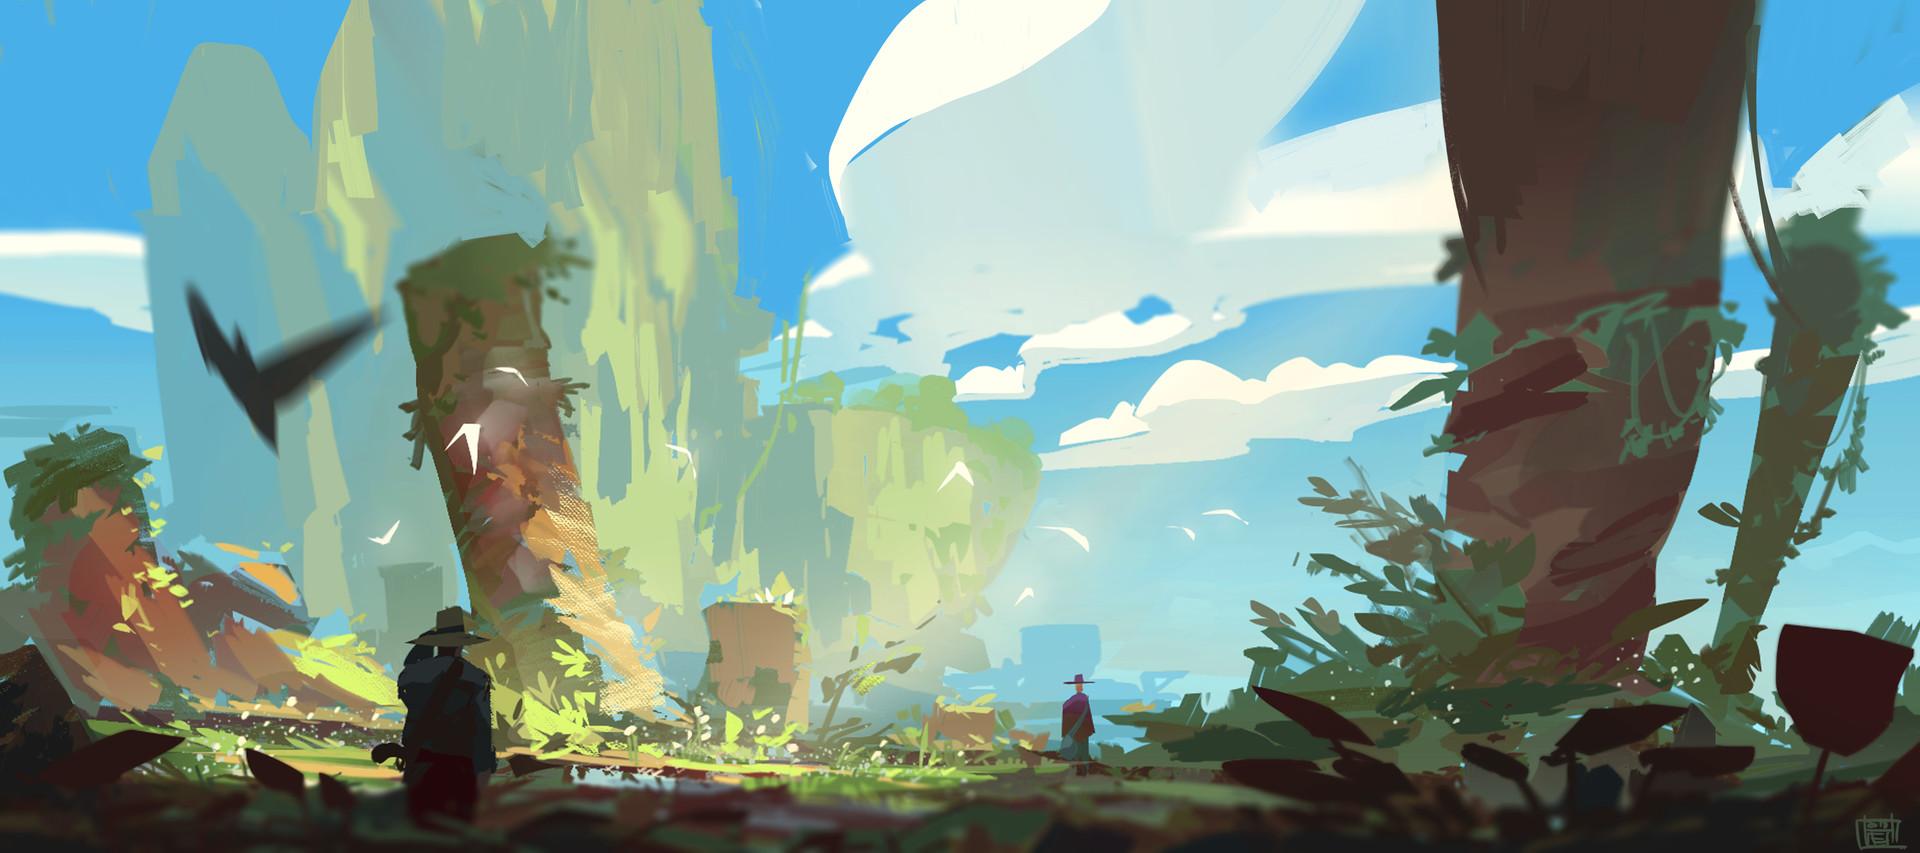 hue-teo-environment5.jpg